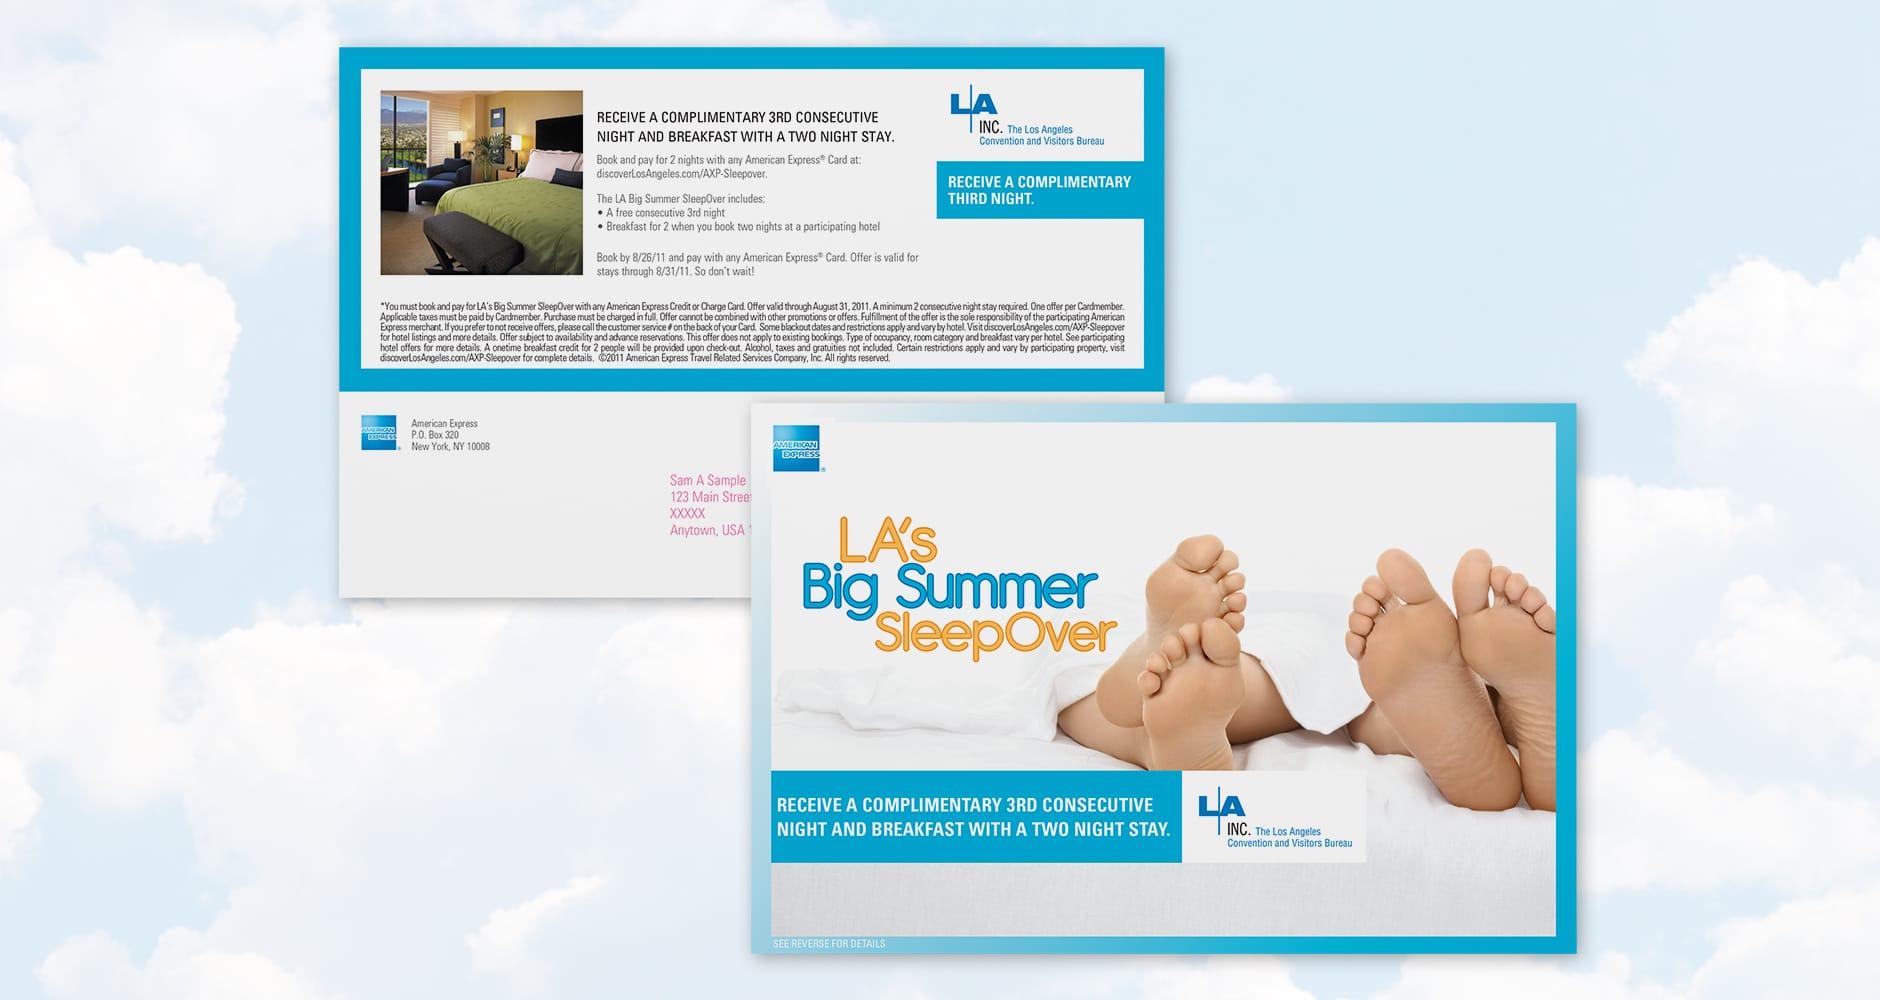 big summer sleepover AMEX extra night postcard